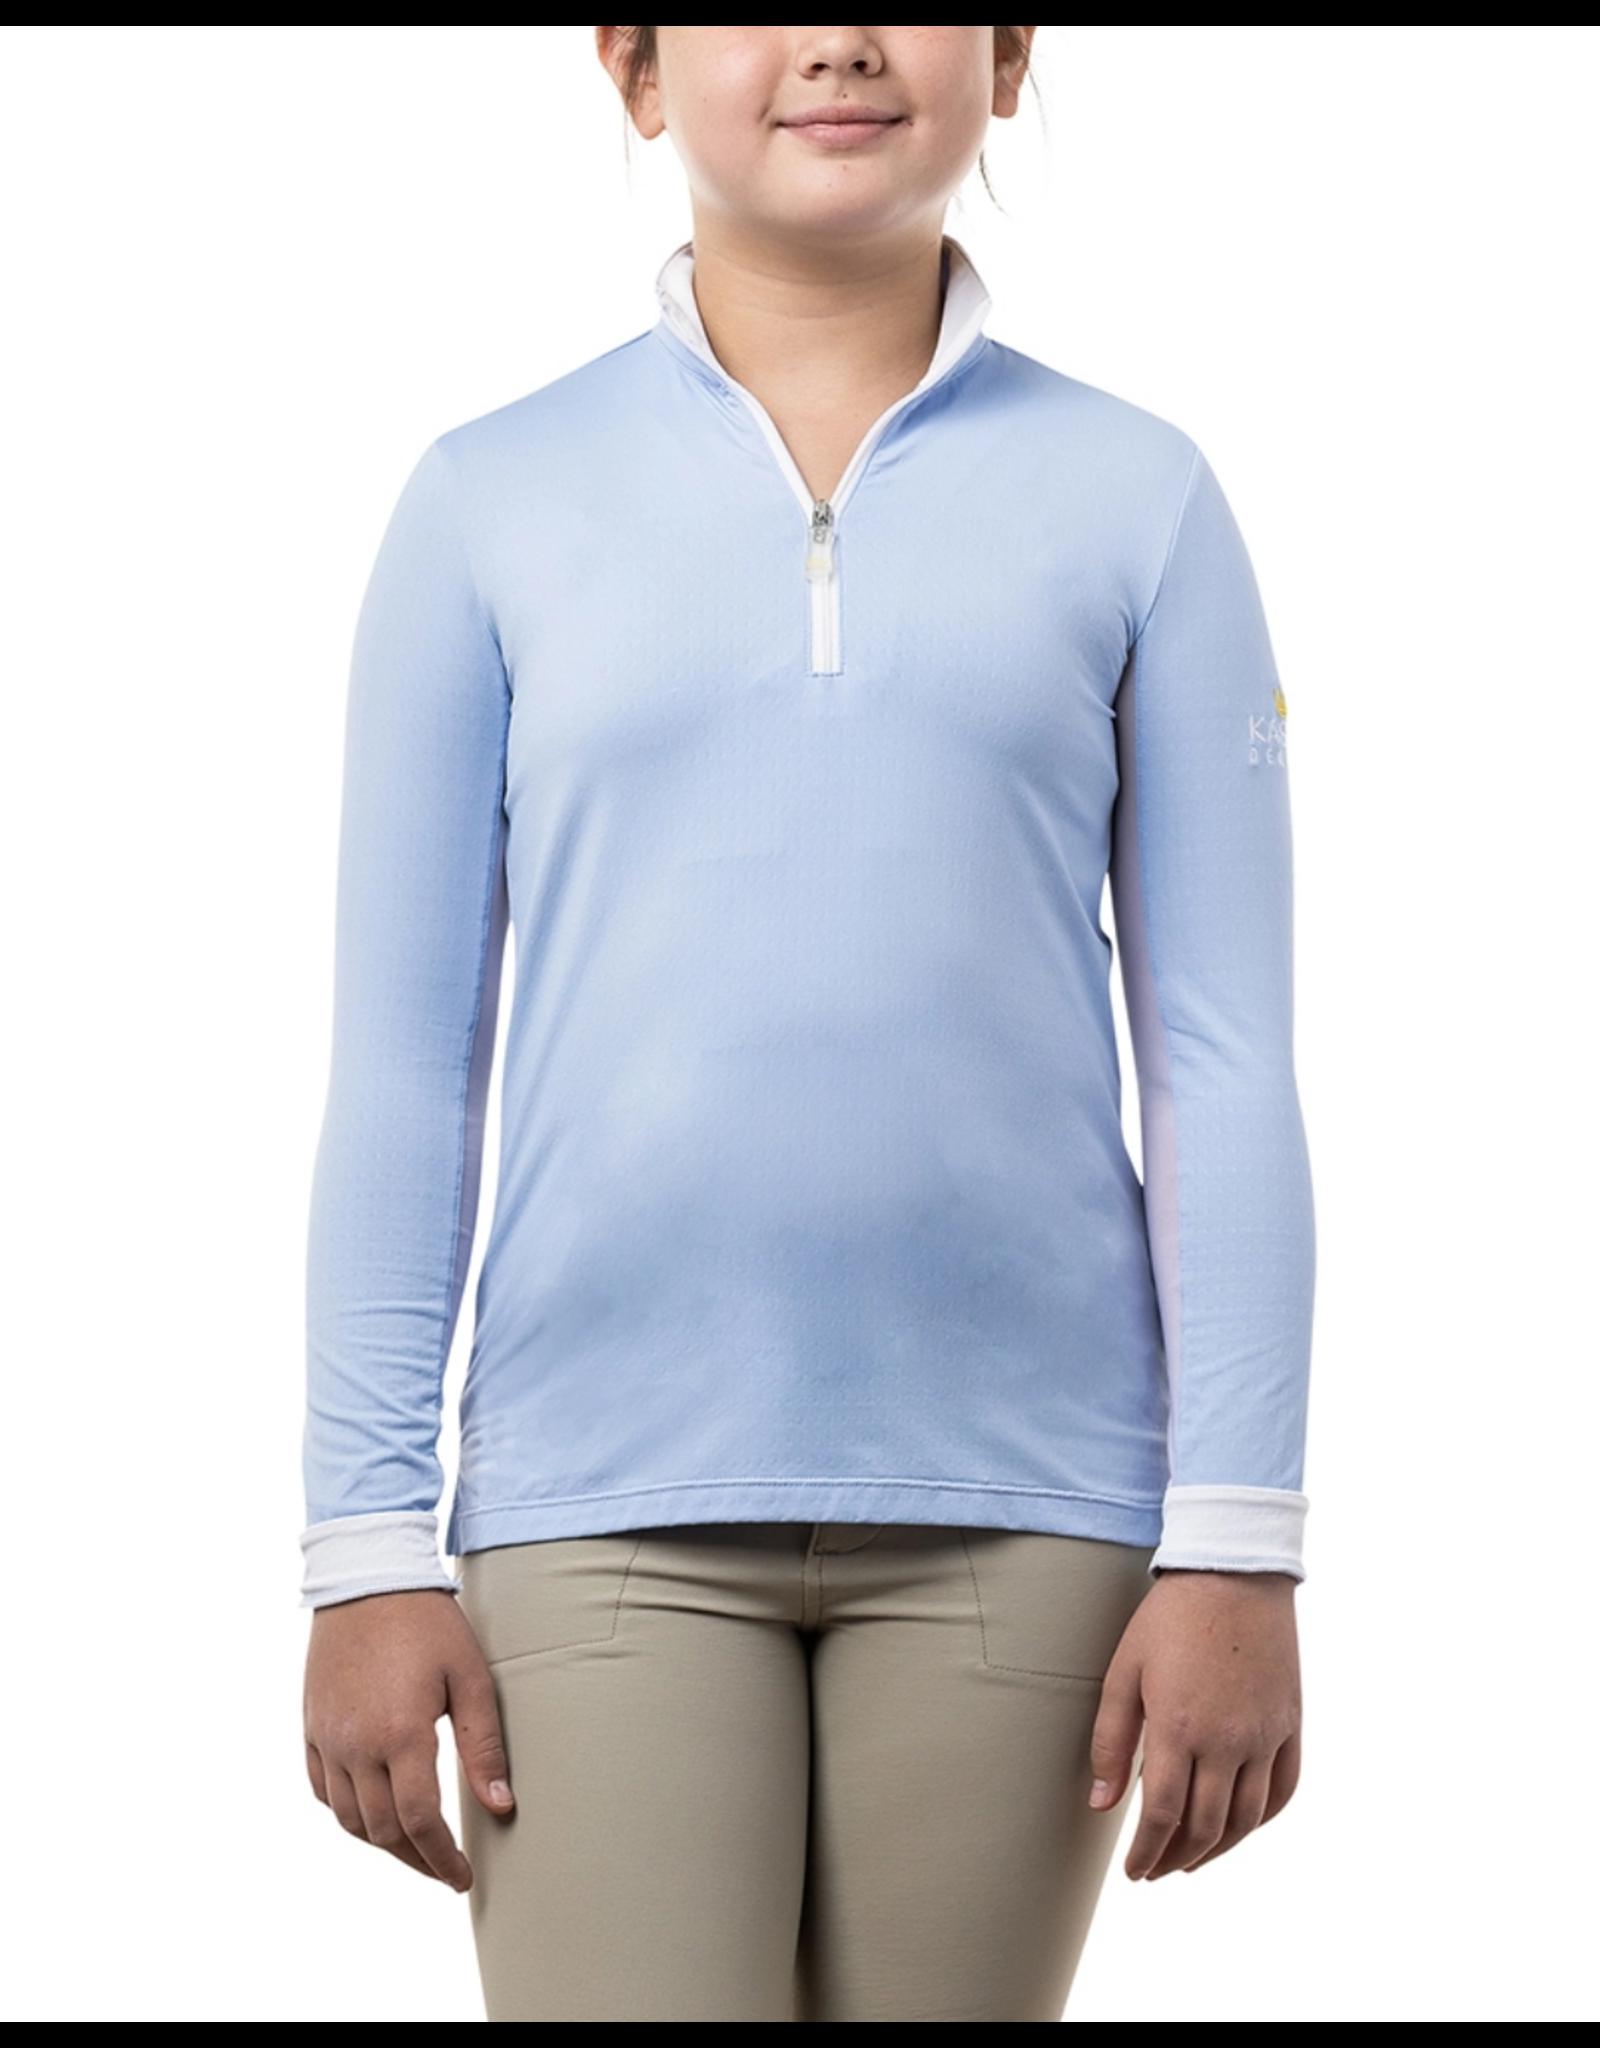 Kastel Sun Shirt Long Sleeve 1/4 Zip Light Blue and White Kids